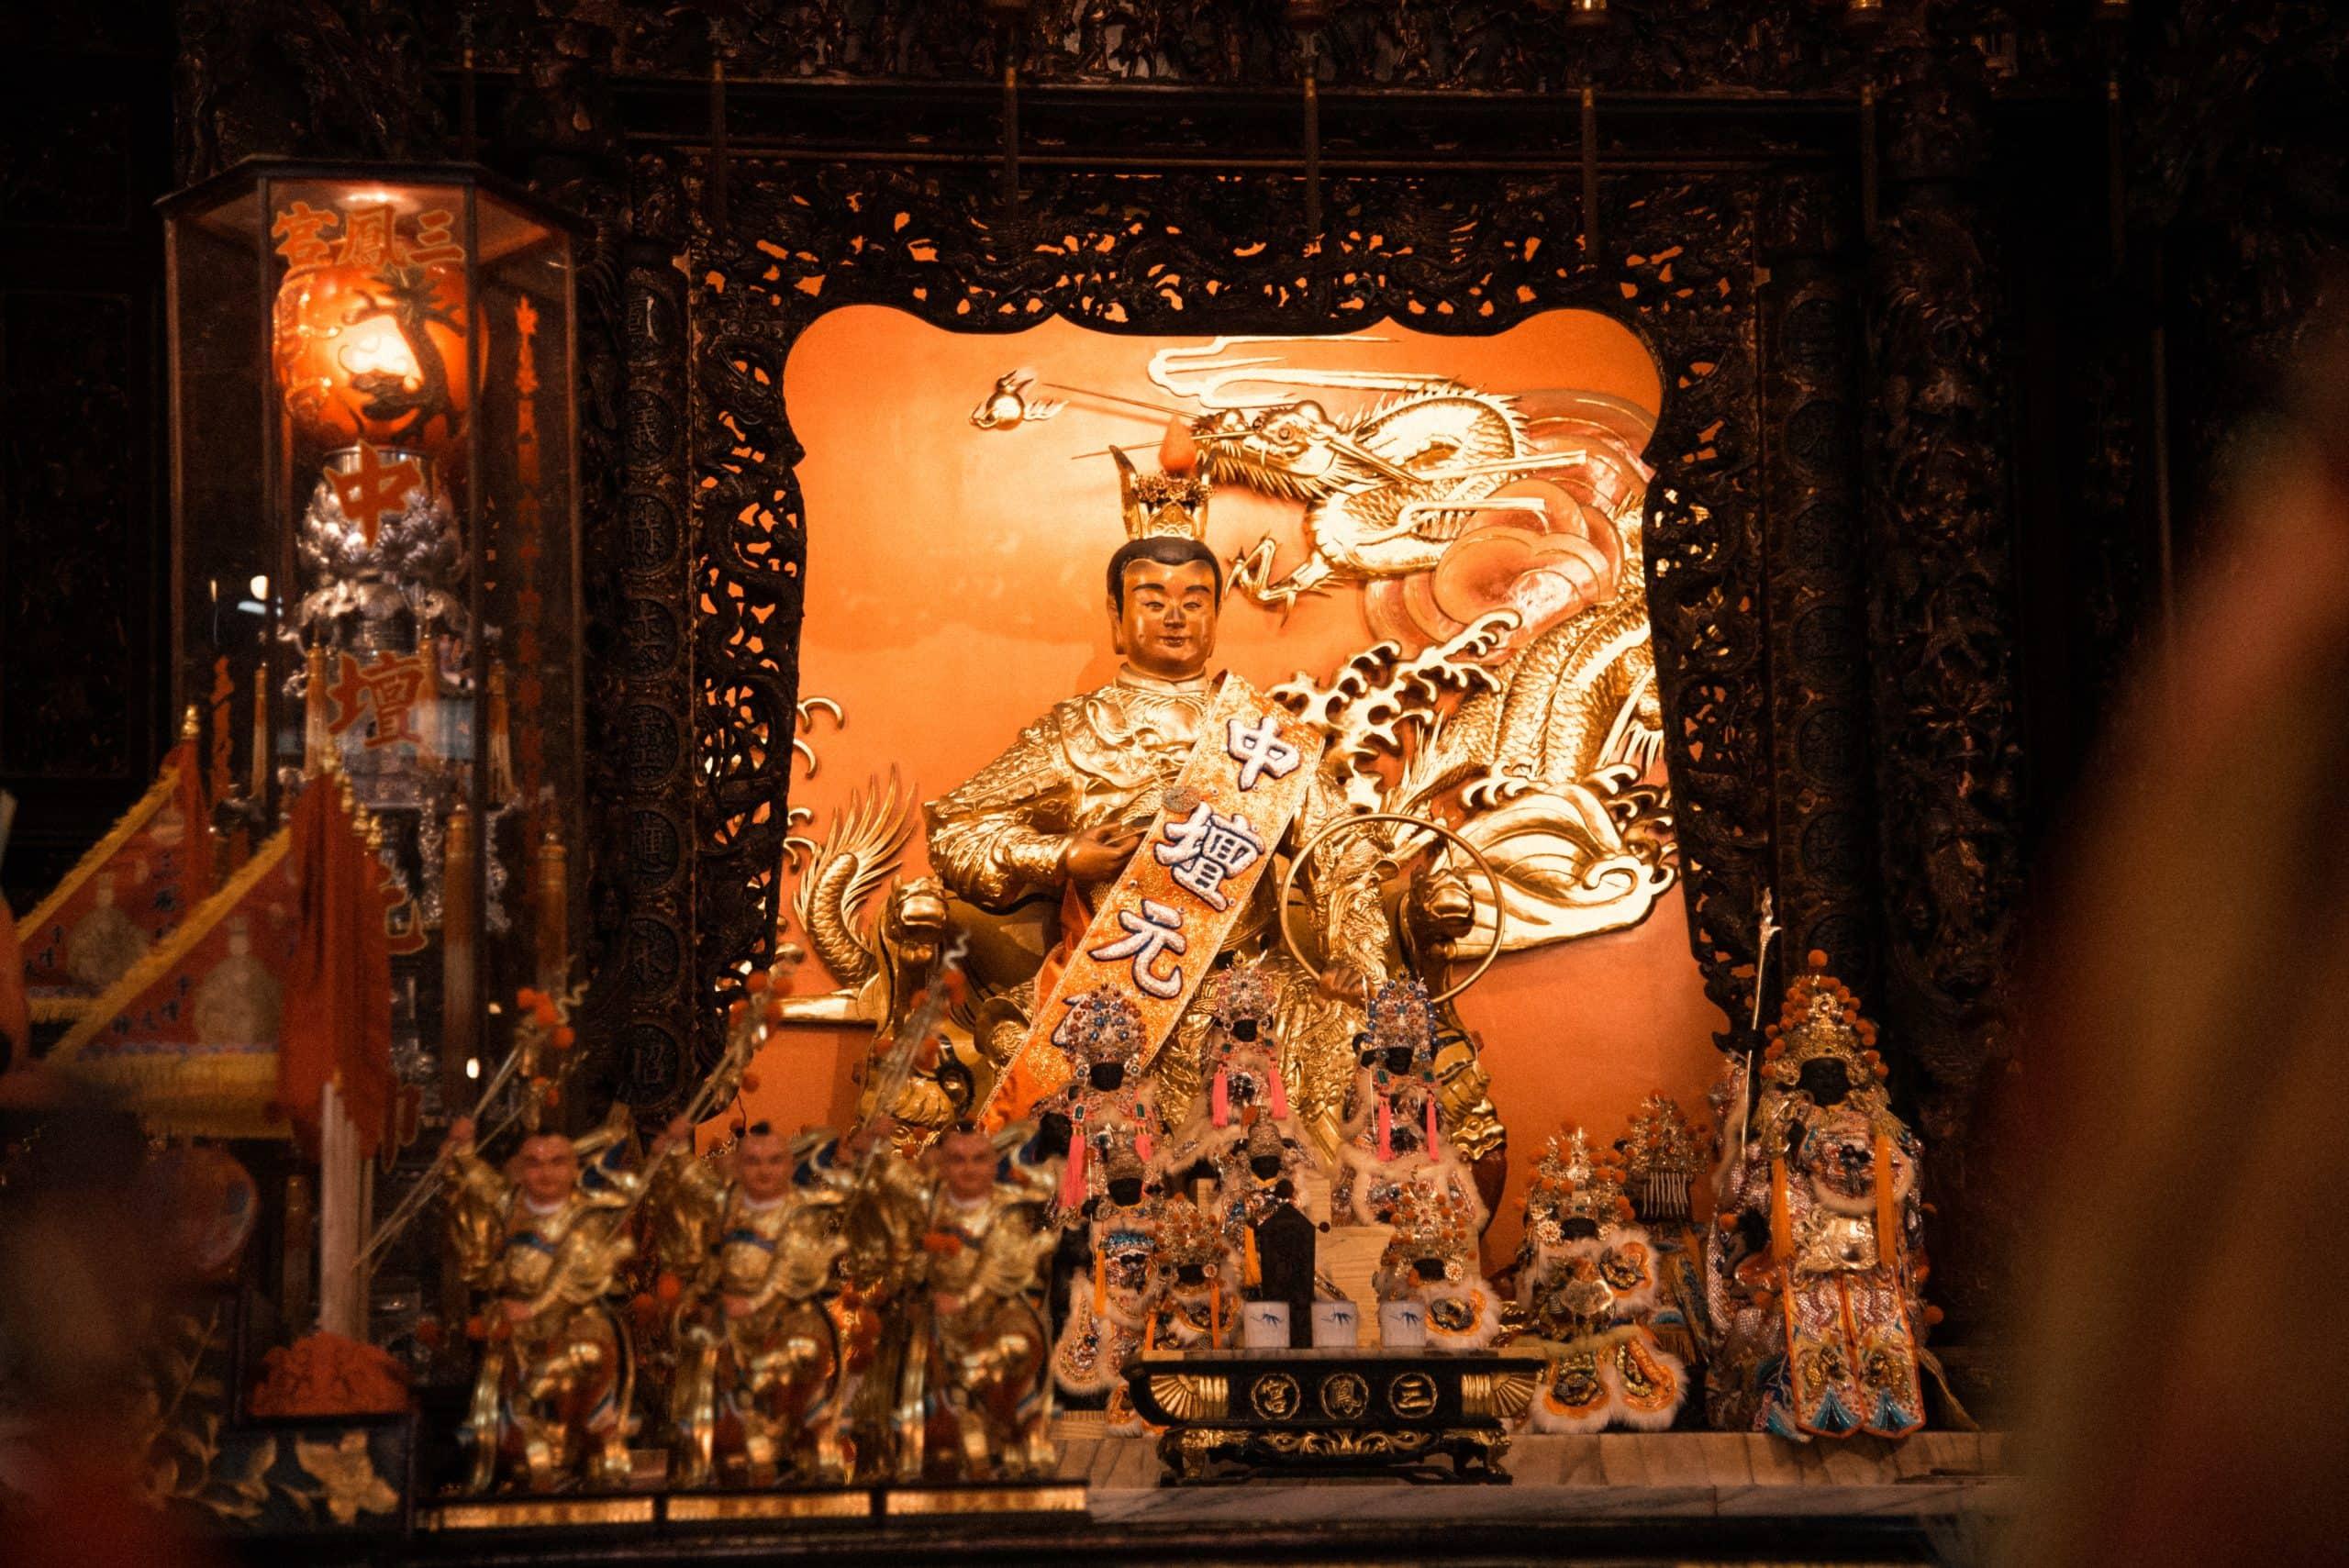 Sunfong Temple (Sanfeng temple)